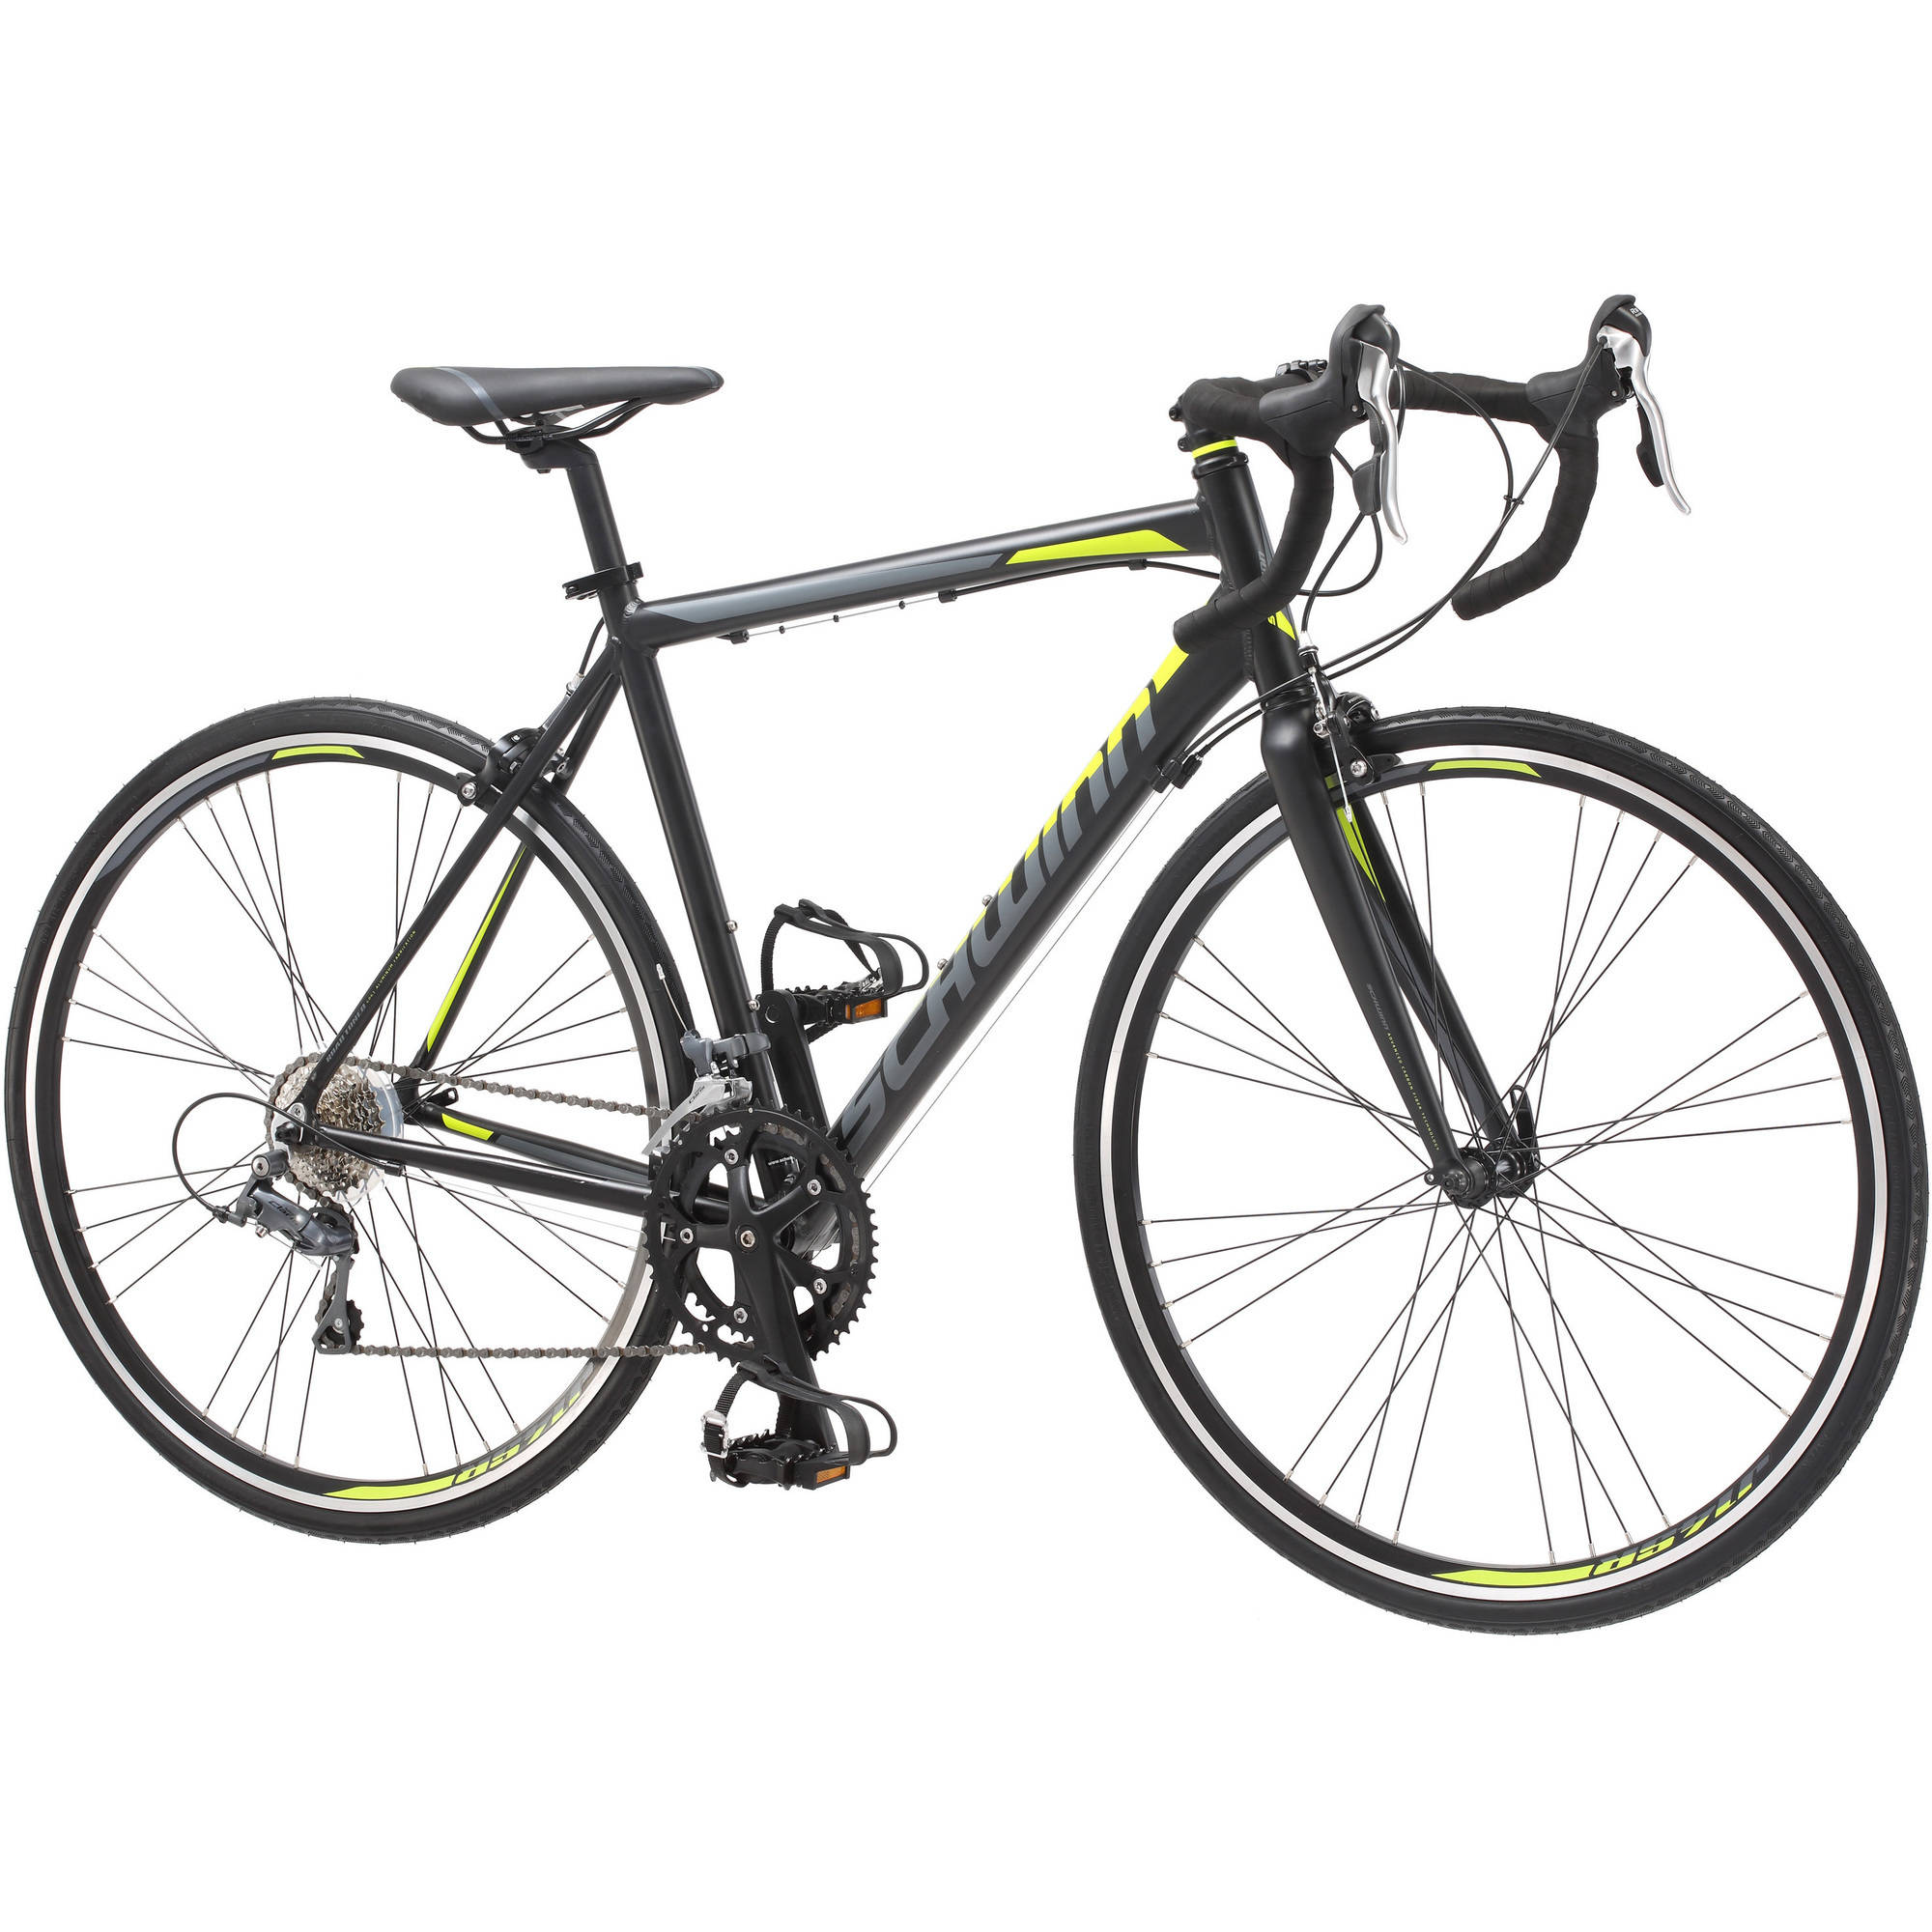 Schwinn Phocus 1600 Road Bike